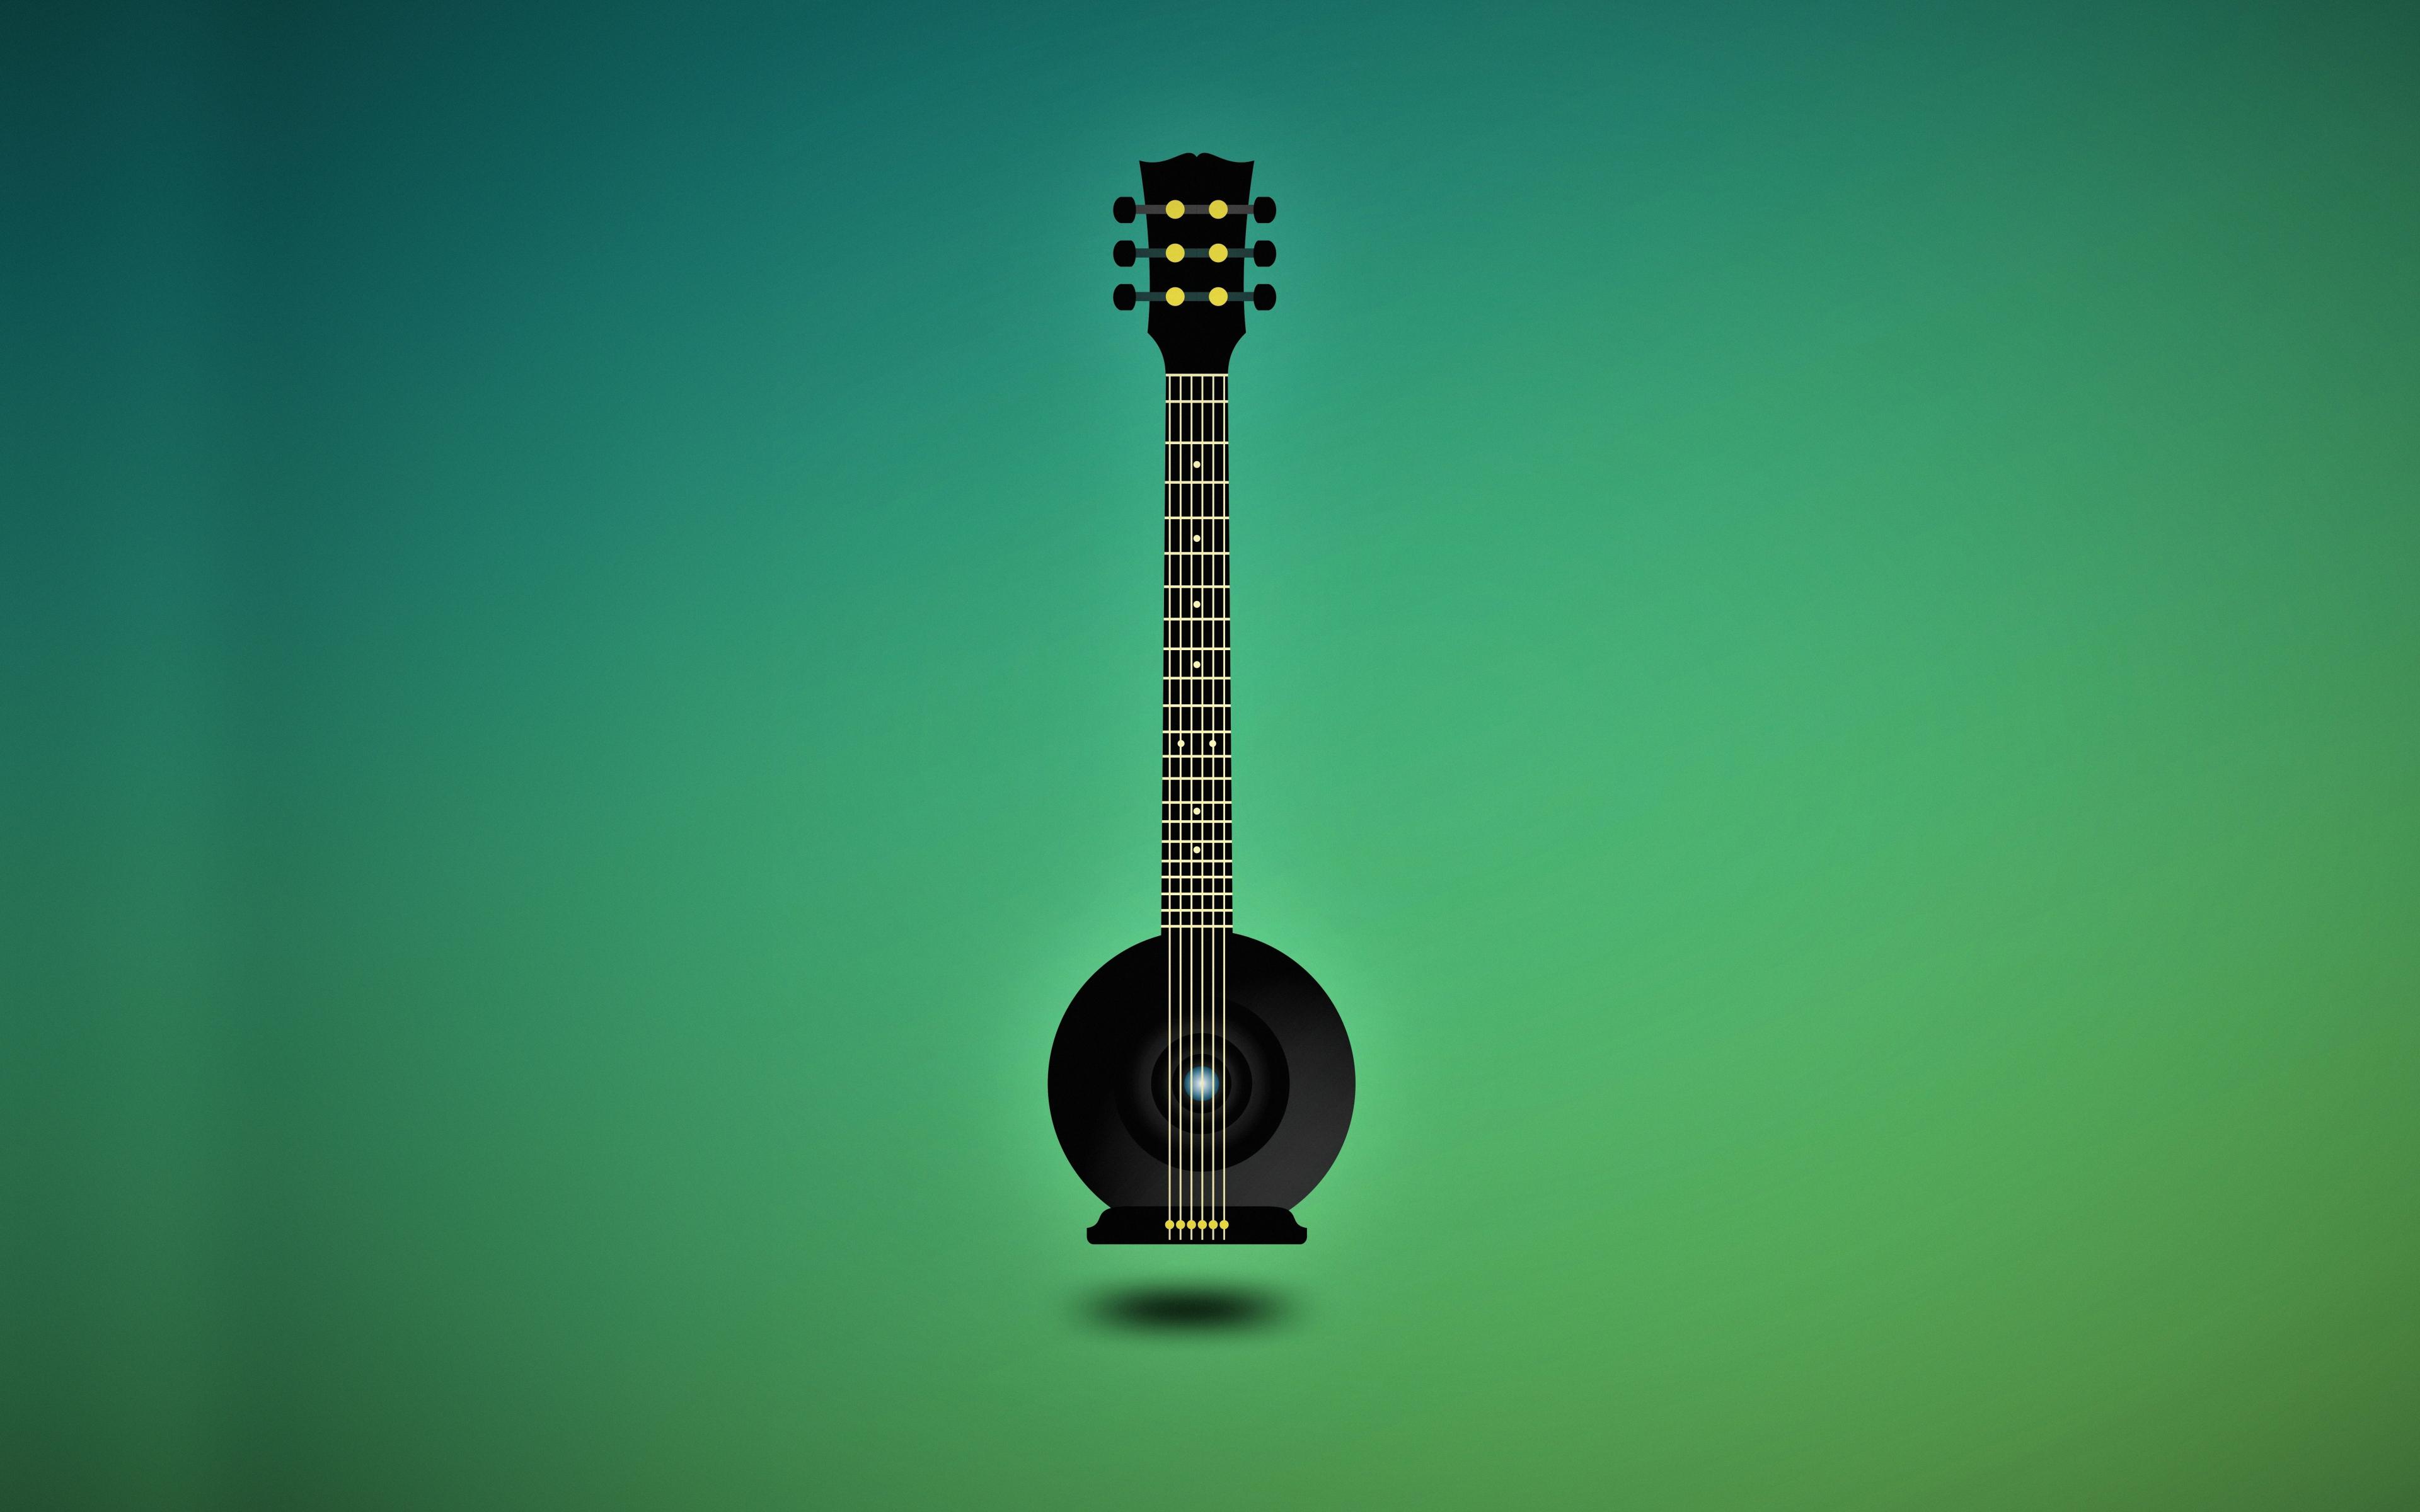 Download 3840x2400 Wallpaper Music Guitar Minimal Art 4k Ultra Hd 16 10 Widescreen 3840x2400 Hd Image Background 16757